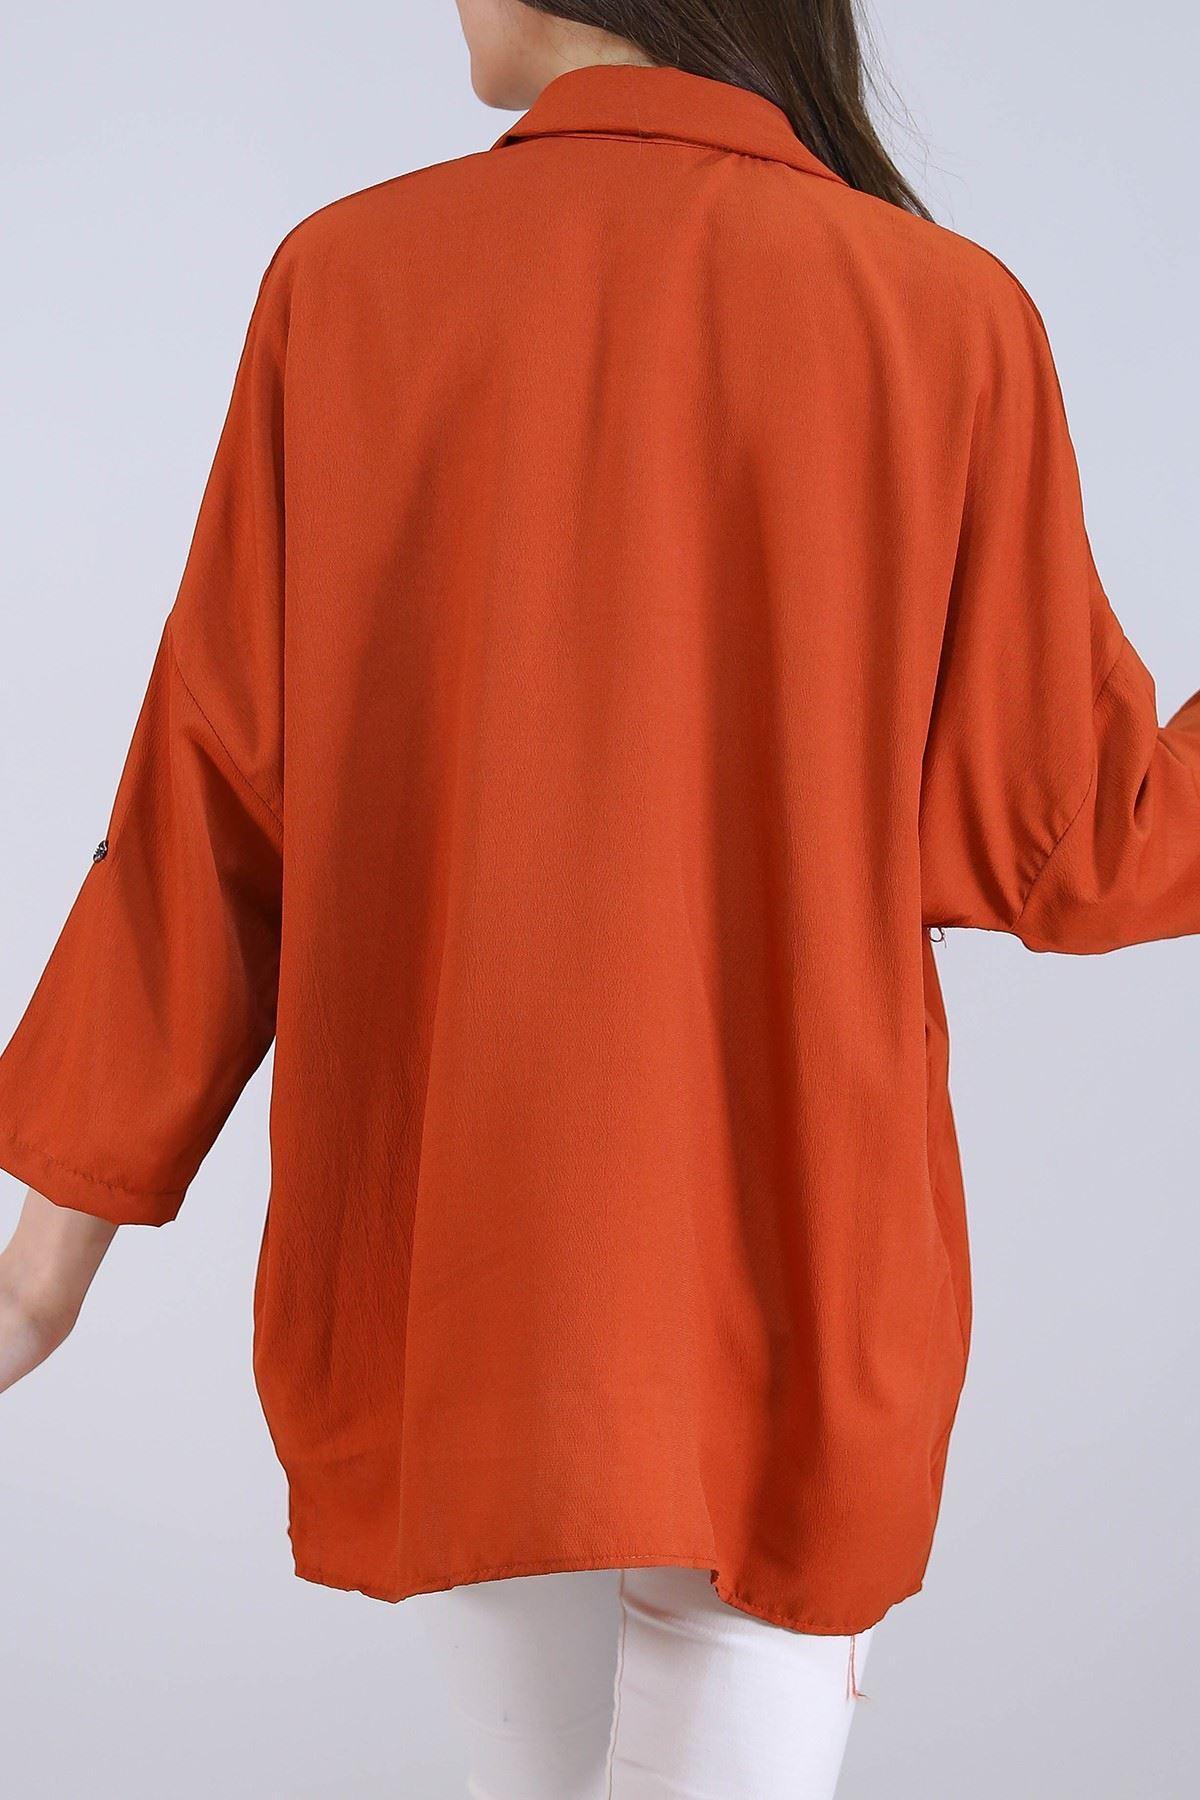 Salaş Gömlek Kiremit - 4806.701.